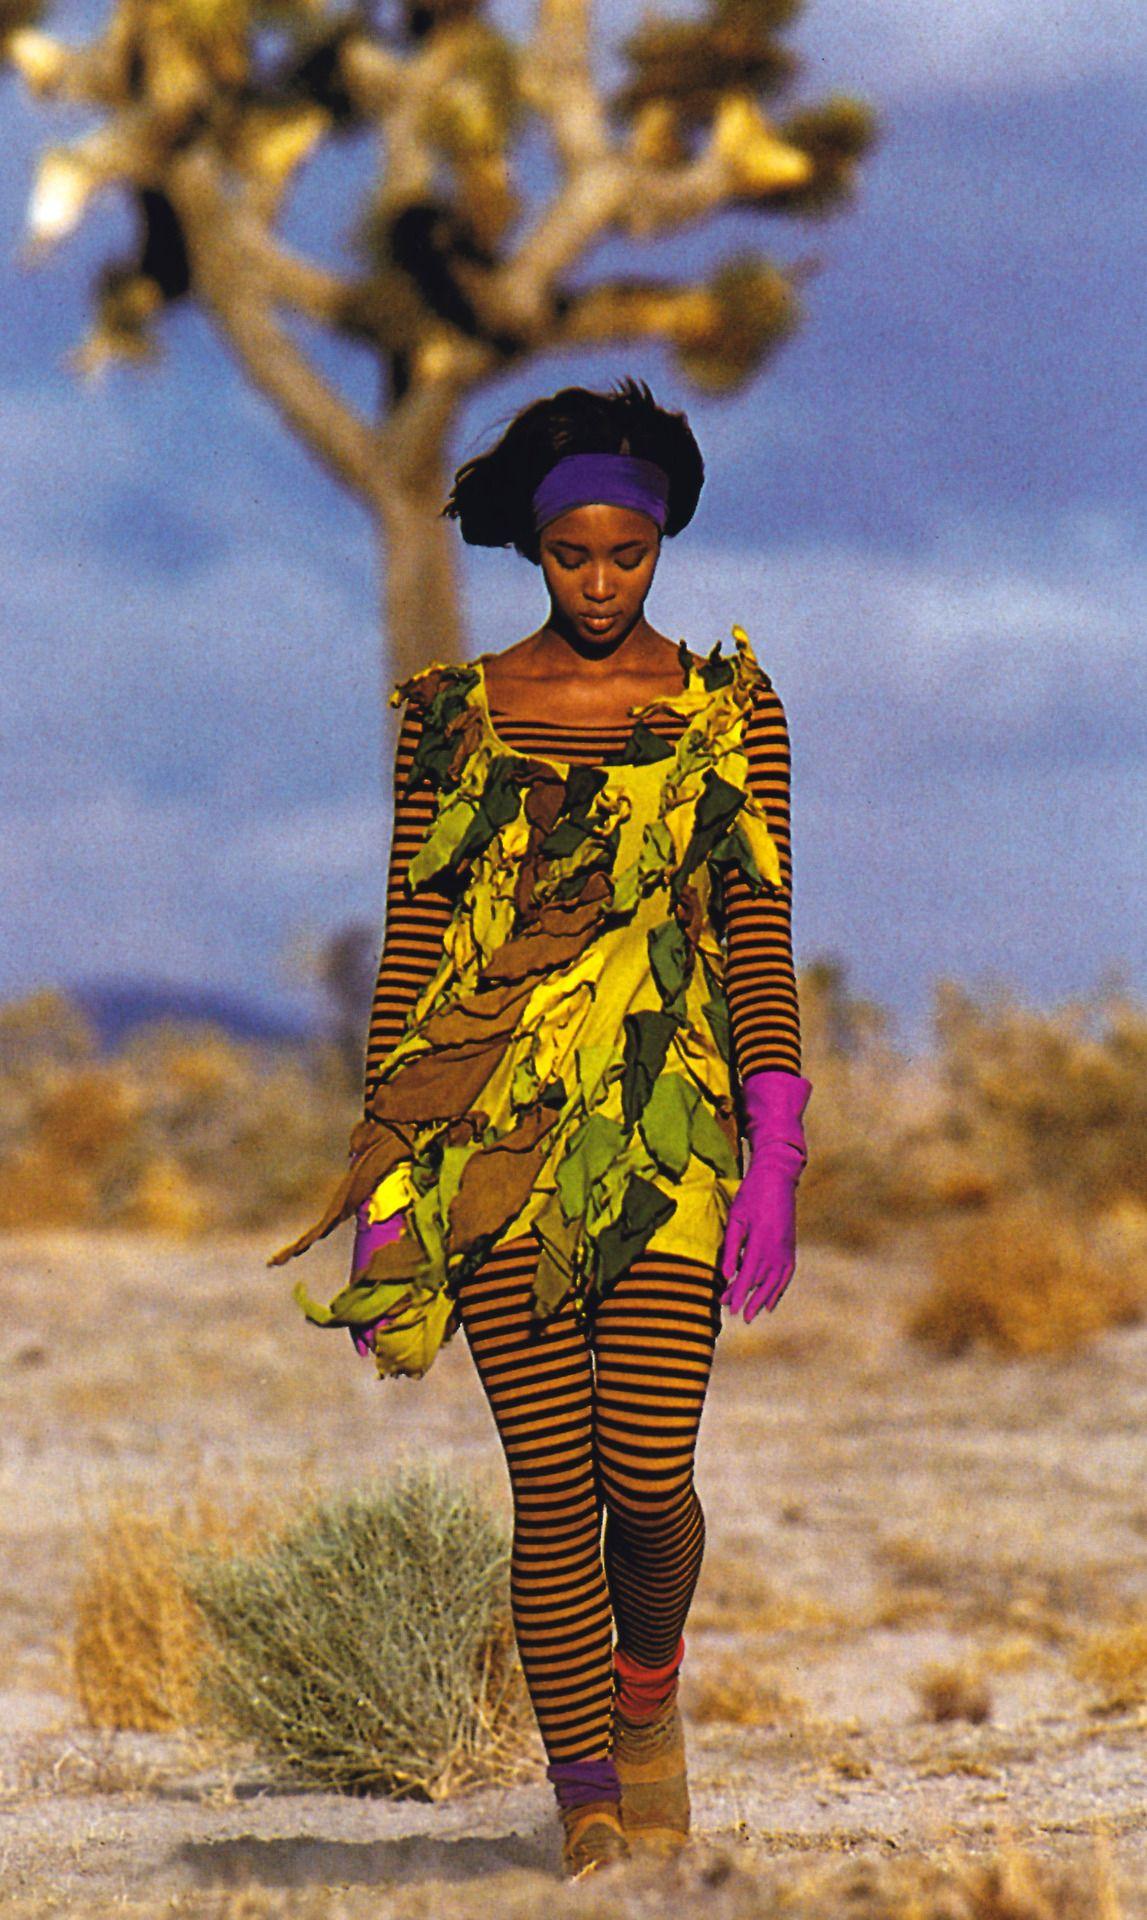 Gilles Bensimon for Elle magazine, August 1990. Clothing by Betsey Johnson.